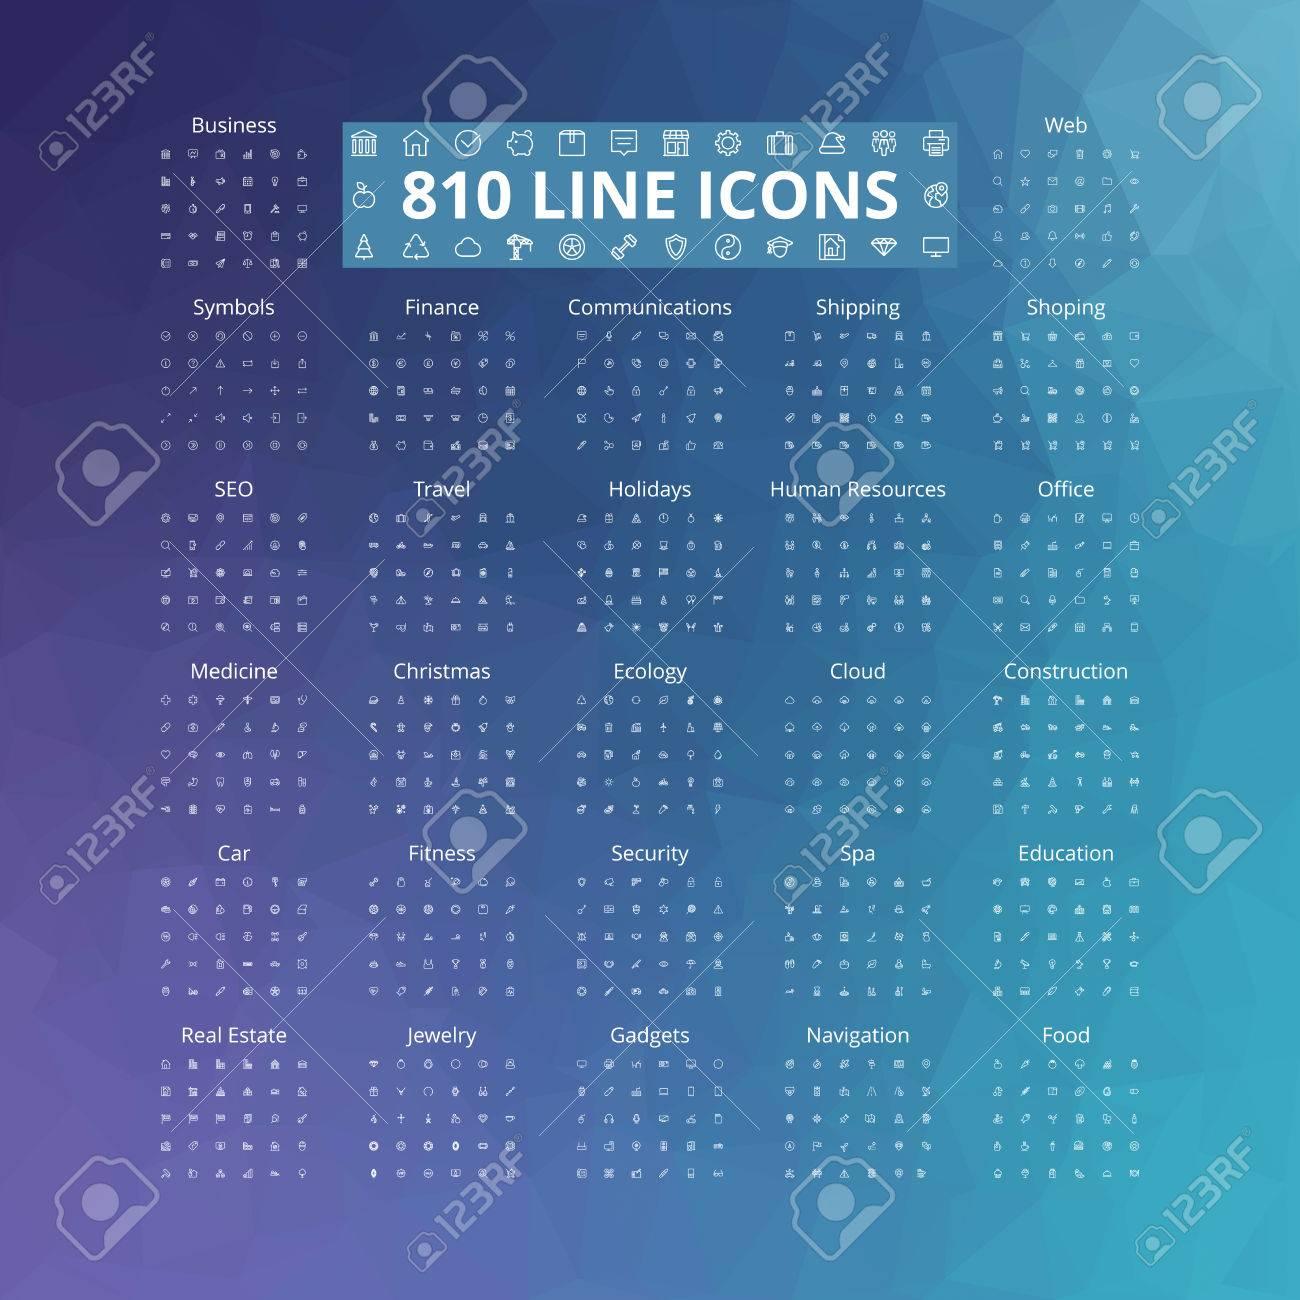 810 line icons set. Vector illustration. Geometric background. - 74523043